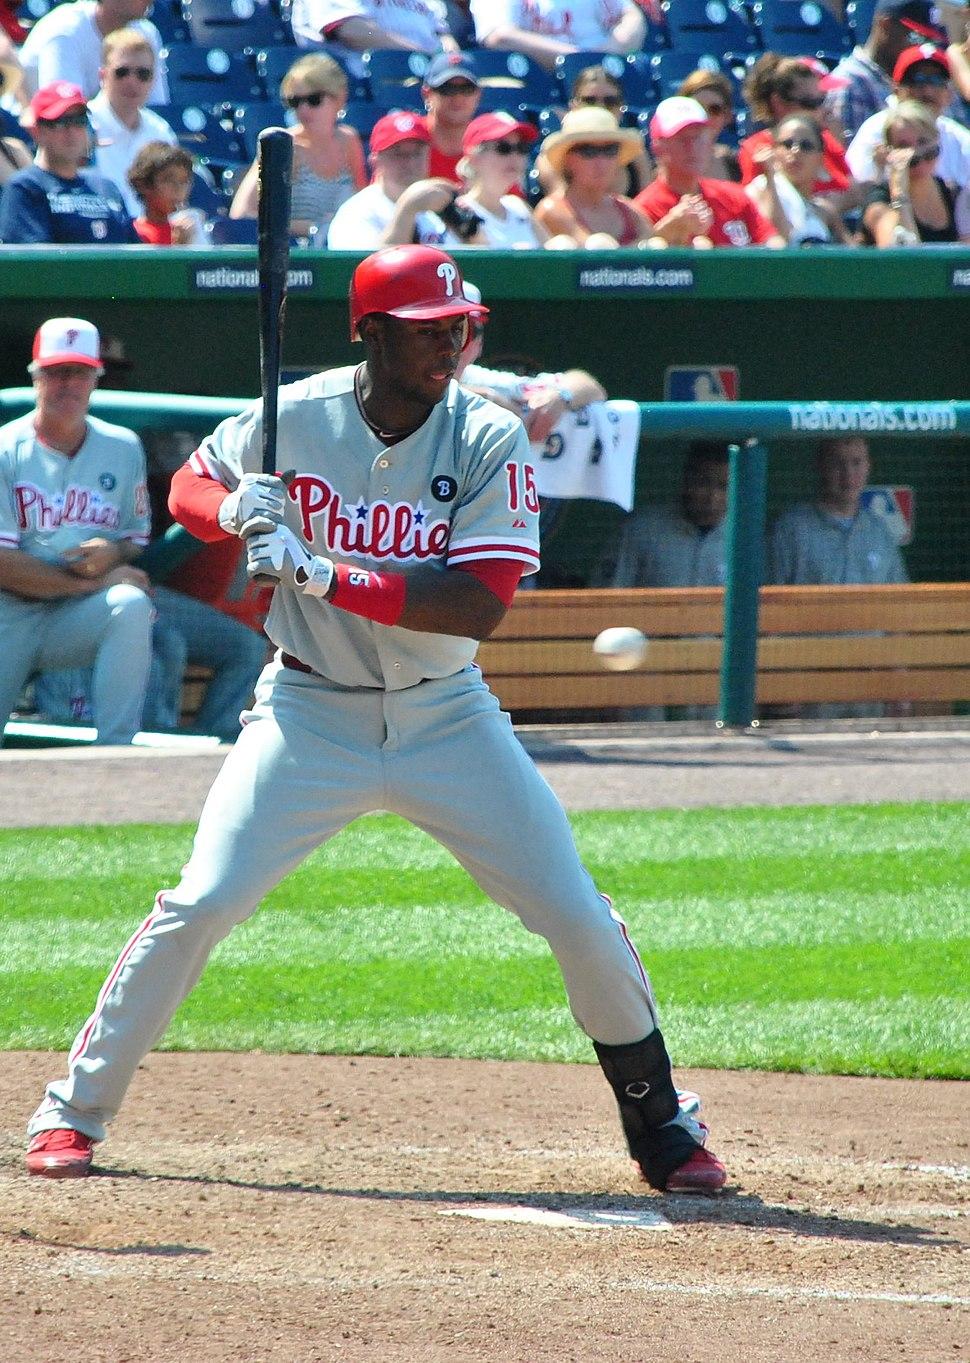 John Mayberry Jr batting